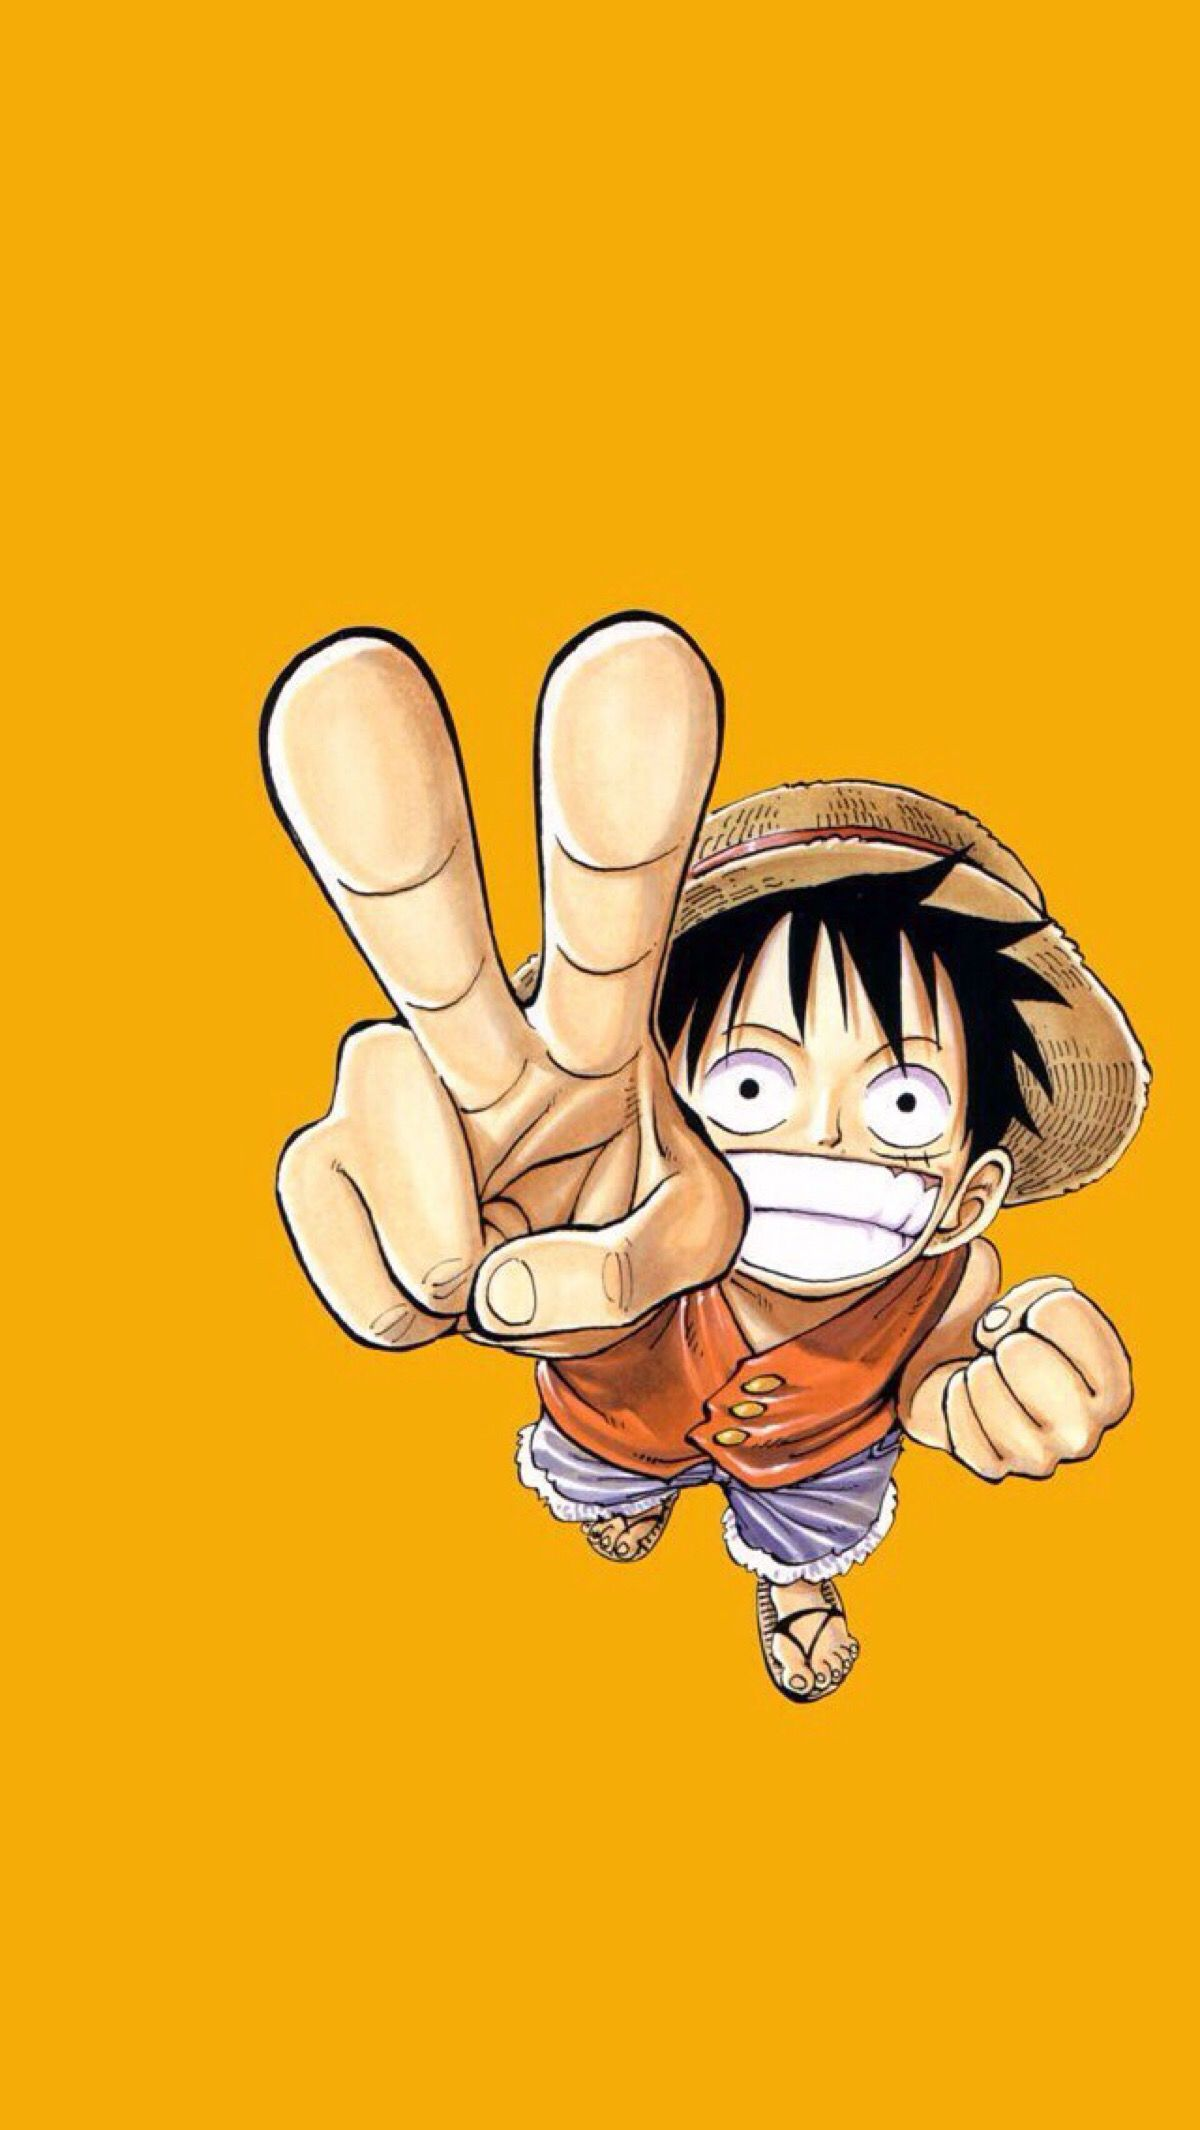 Épinglé par Neo Faiz sur One piece Luffy Fond ecran